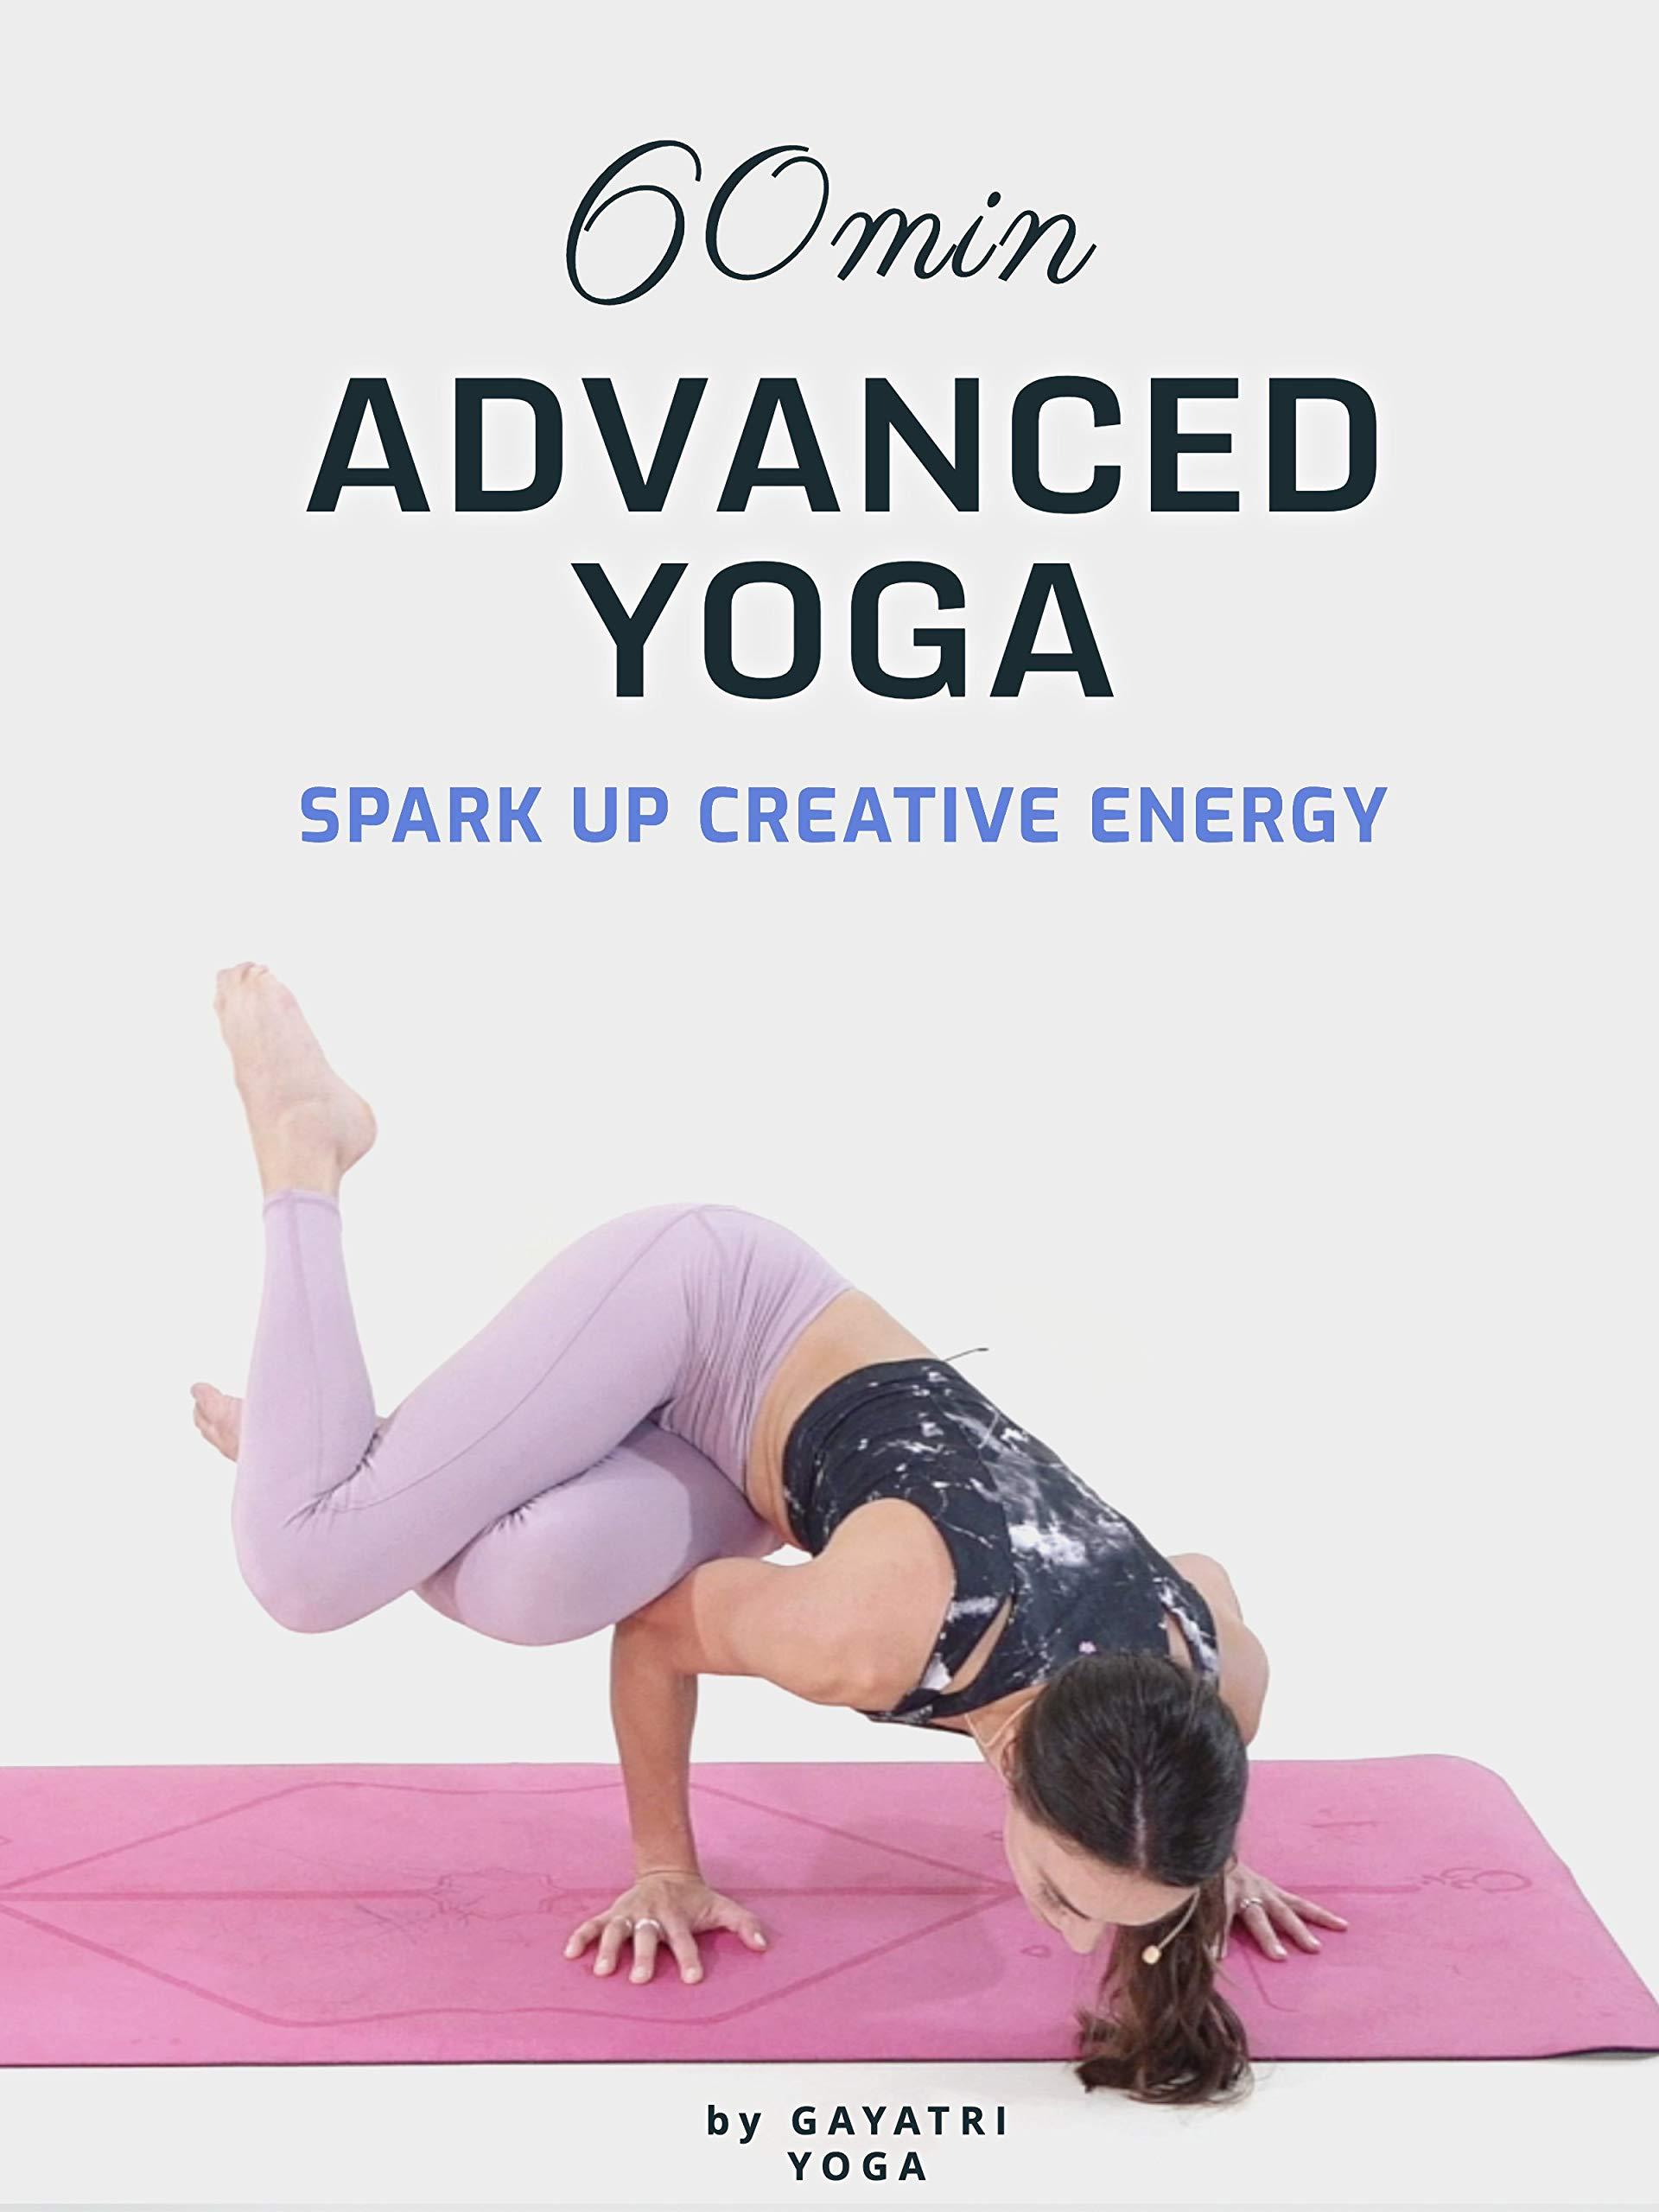 60 Min Advanced Yoga - Spark Up Creative Energy - Gayatri Yoga